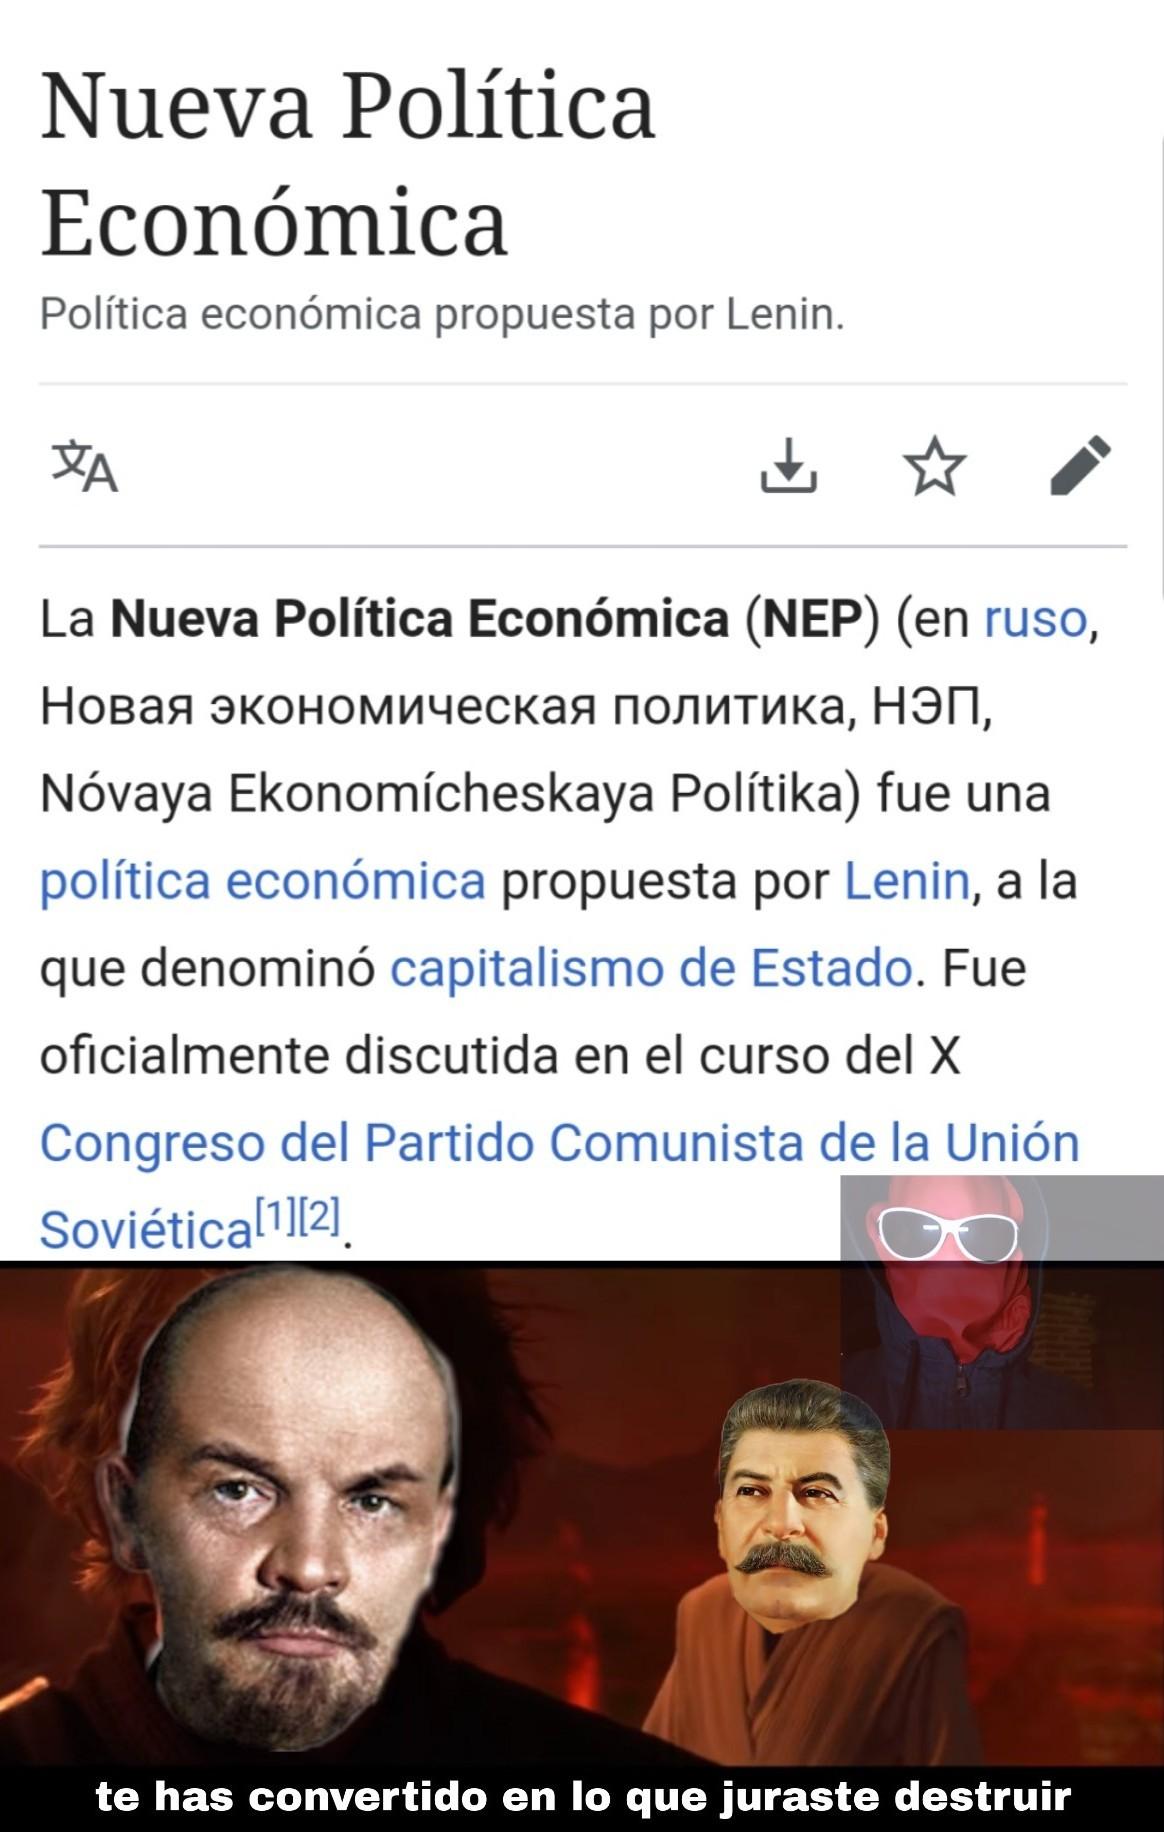 Maldicion jimbo,el socialismo no funciona - meme